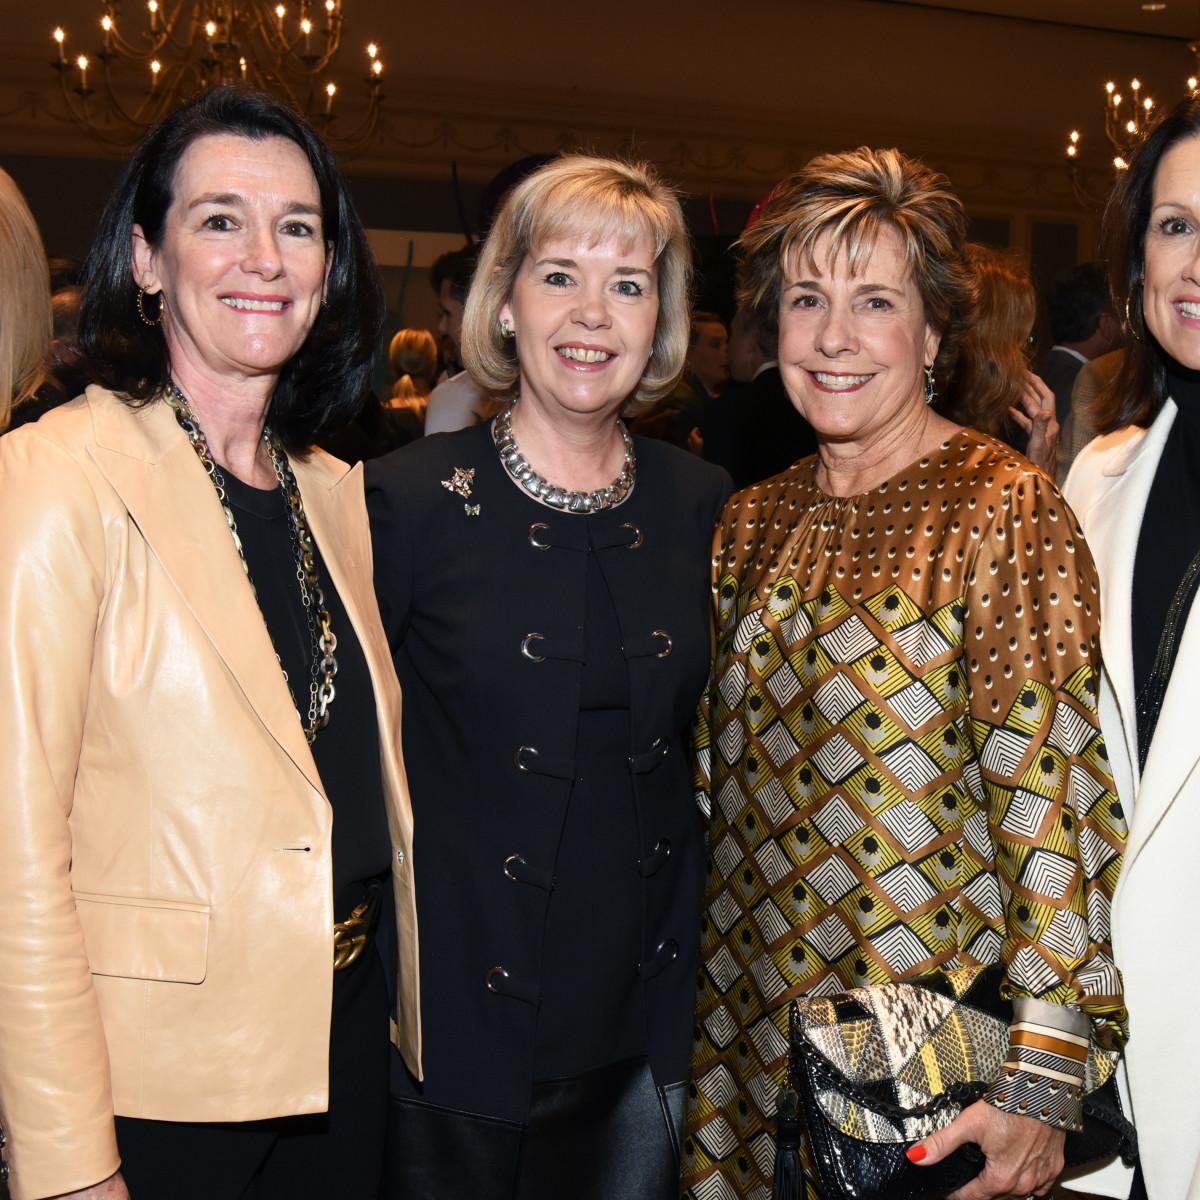 Leslie Diers, Christie Carter, Becky Good, Pam Perella